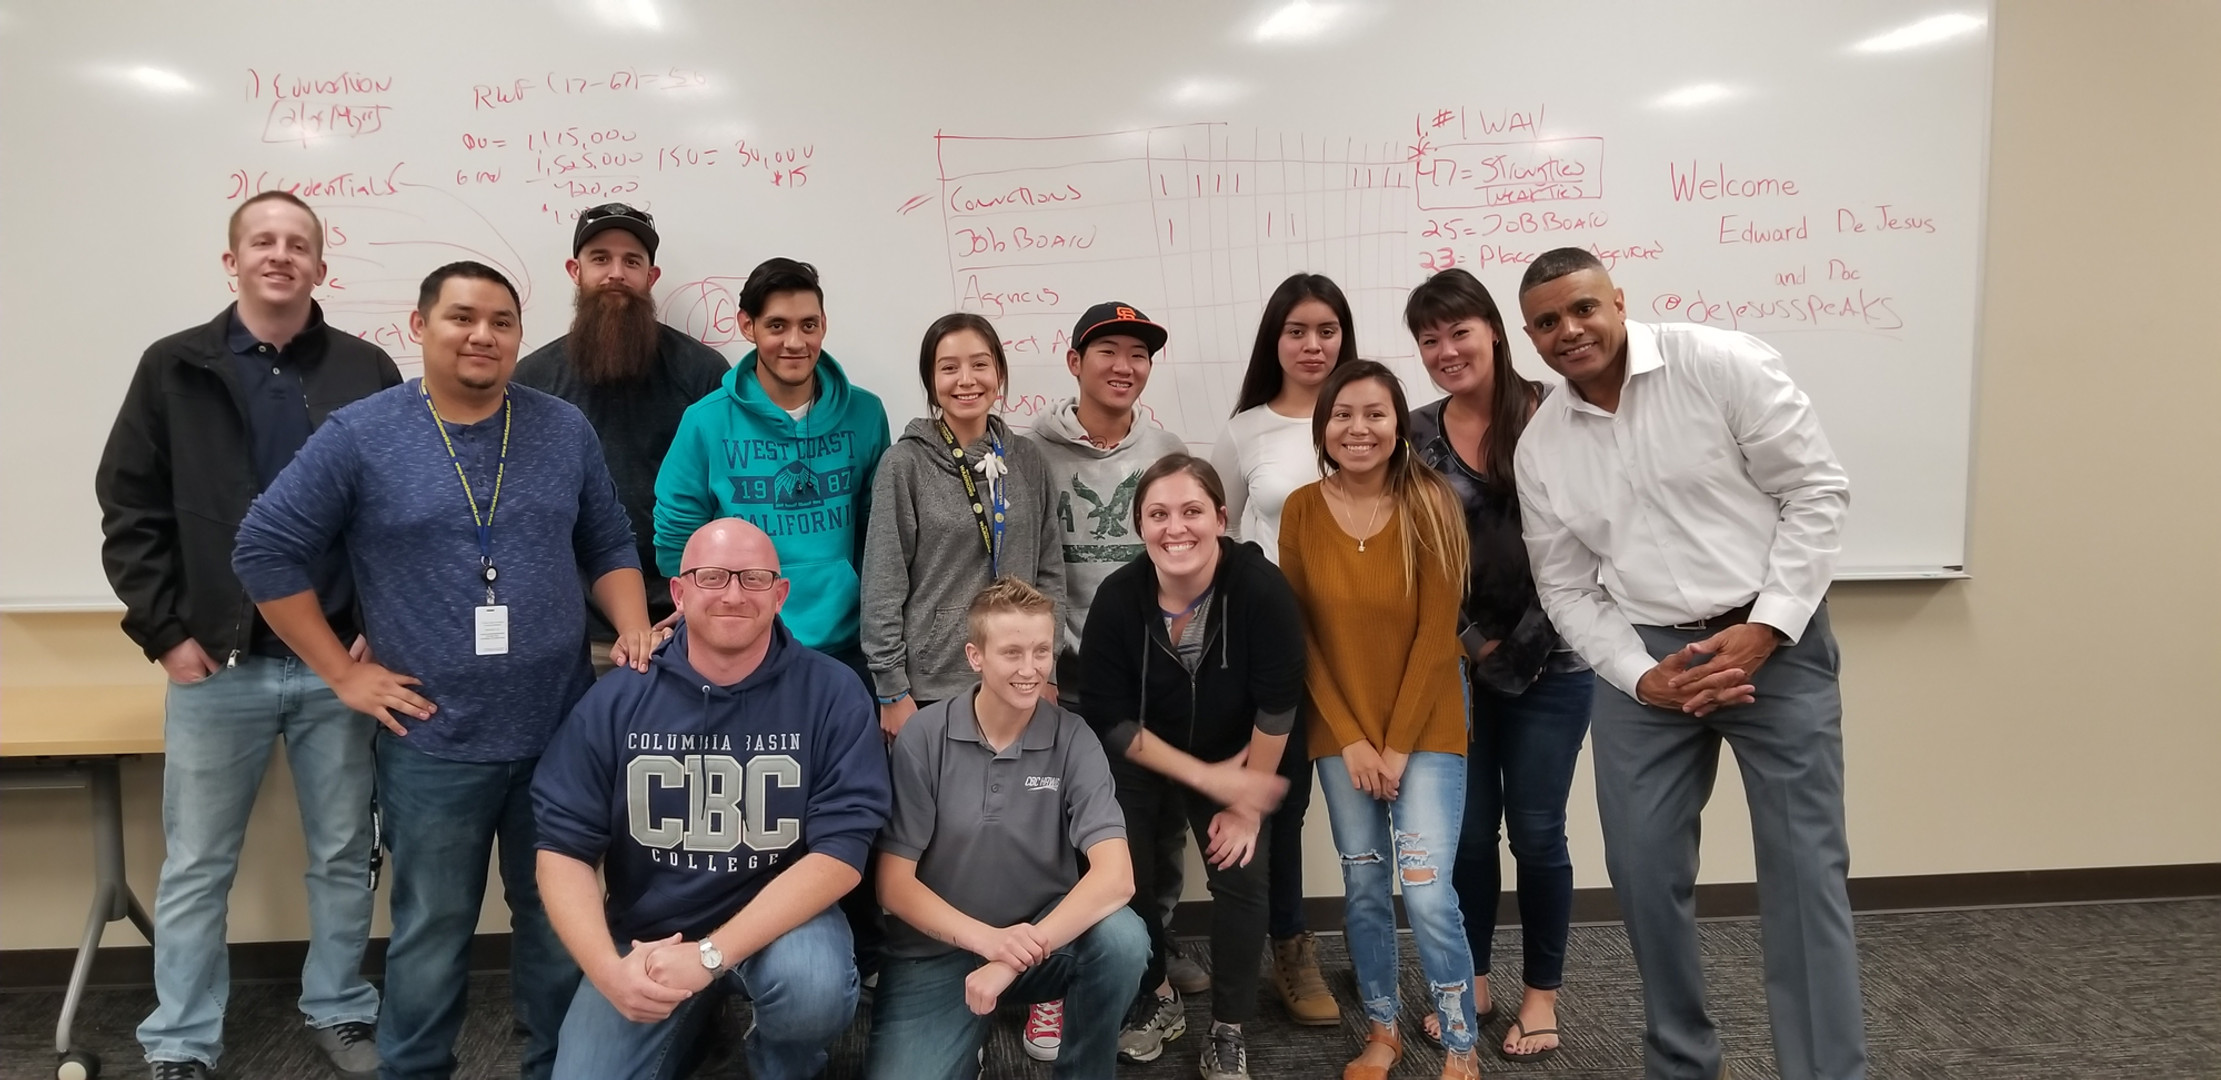 Social Capital Builders Washington